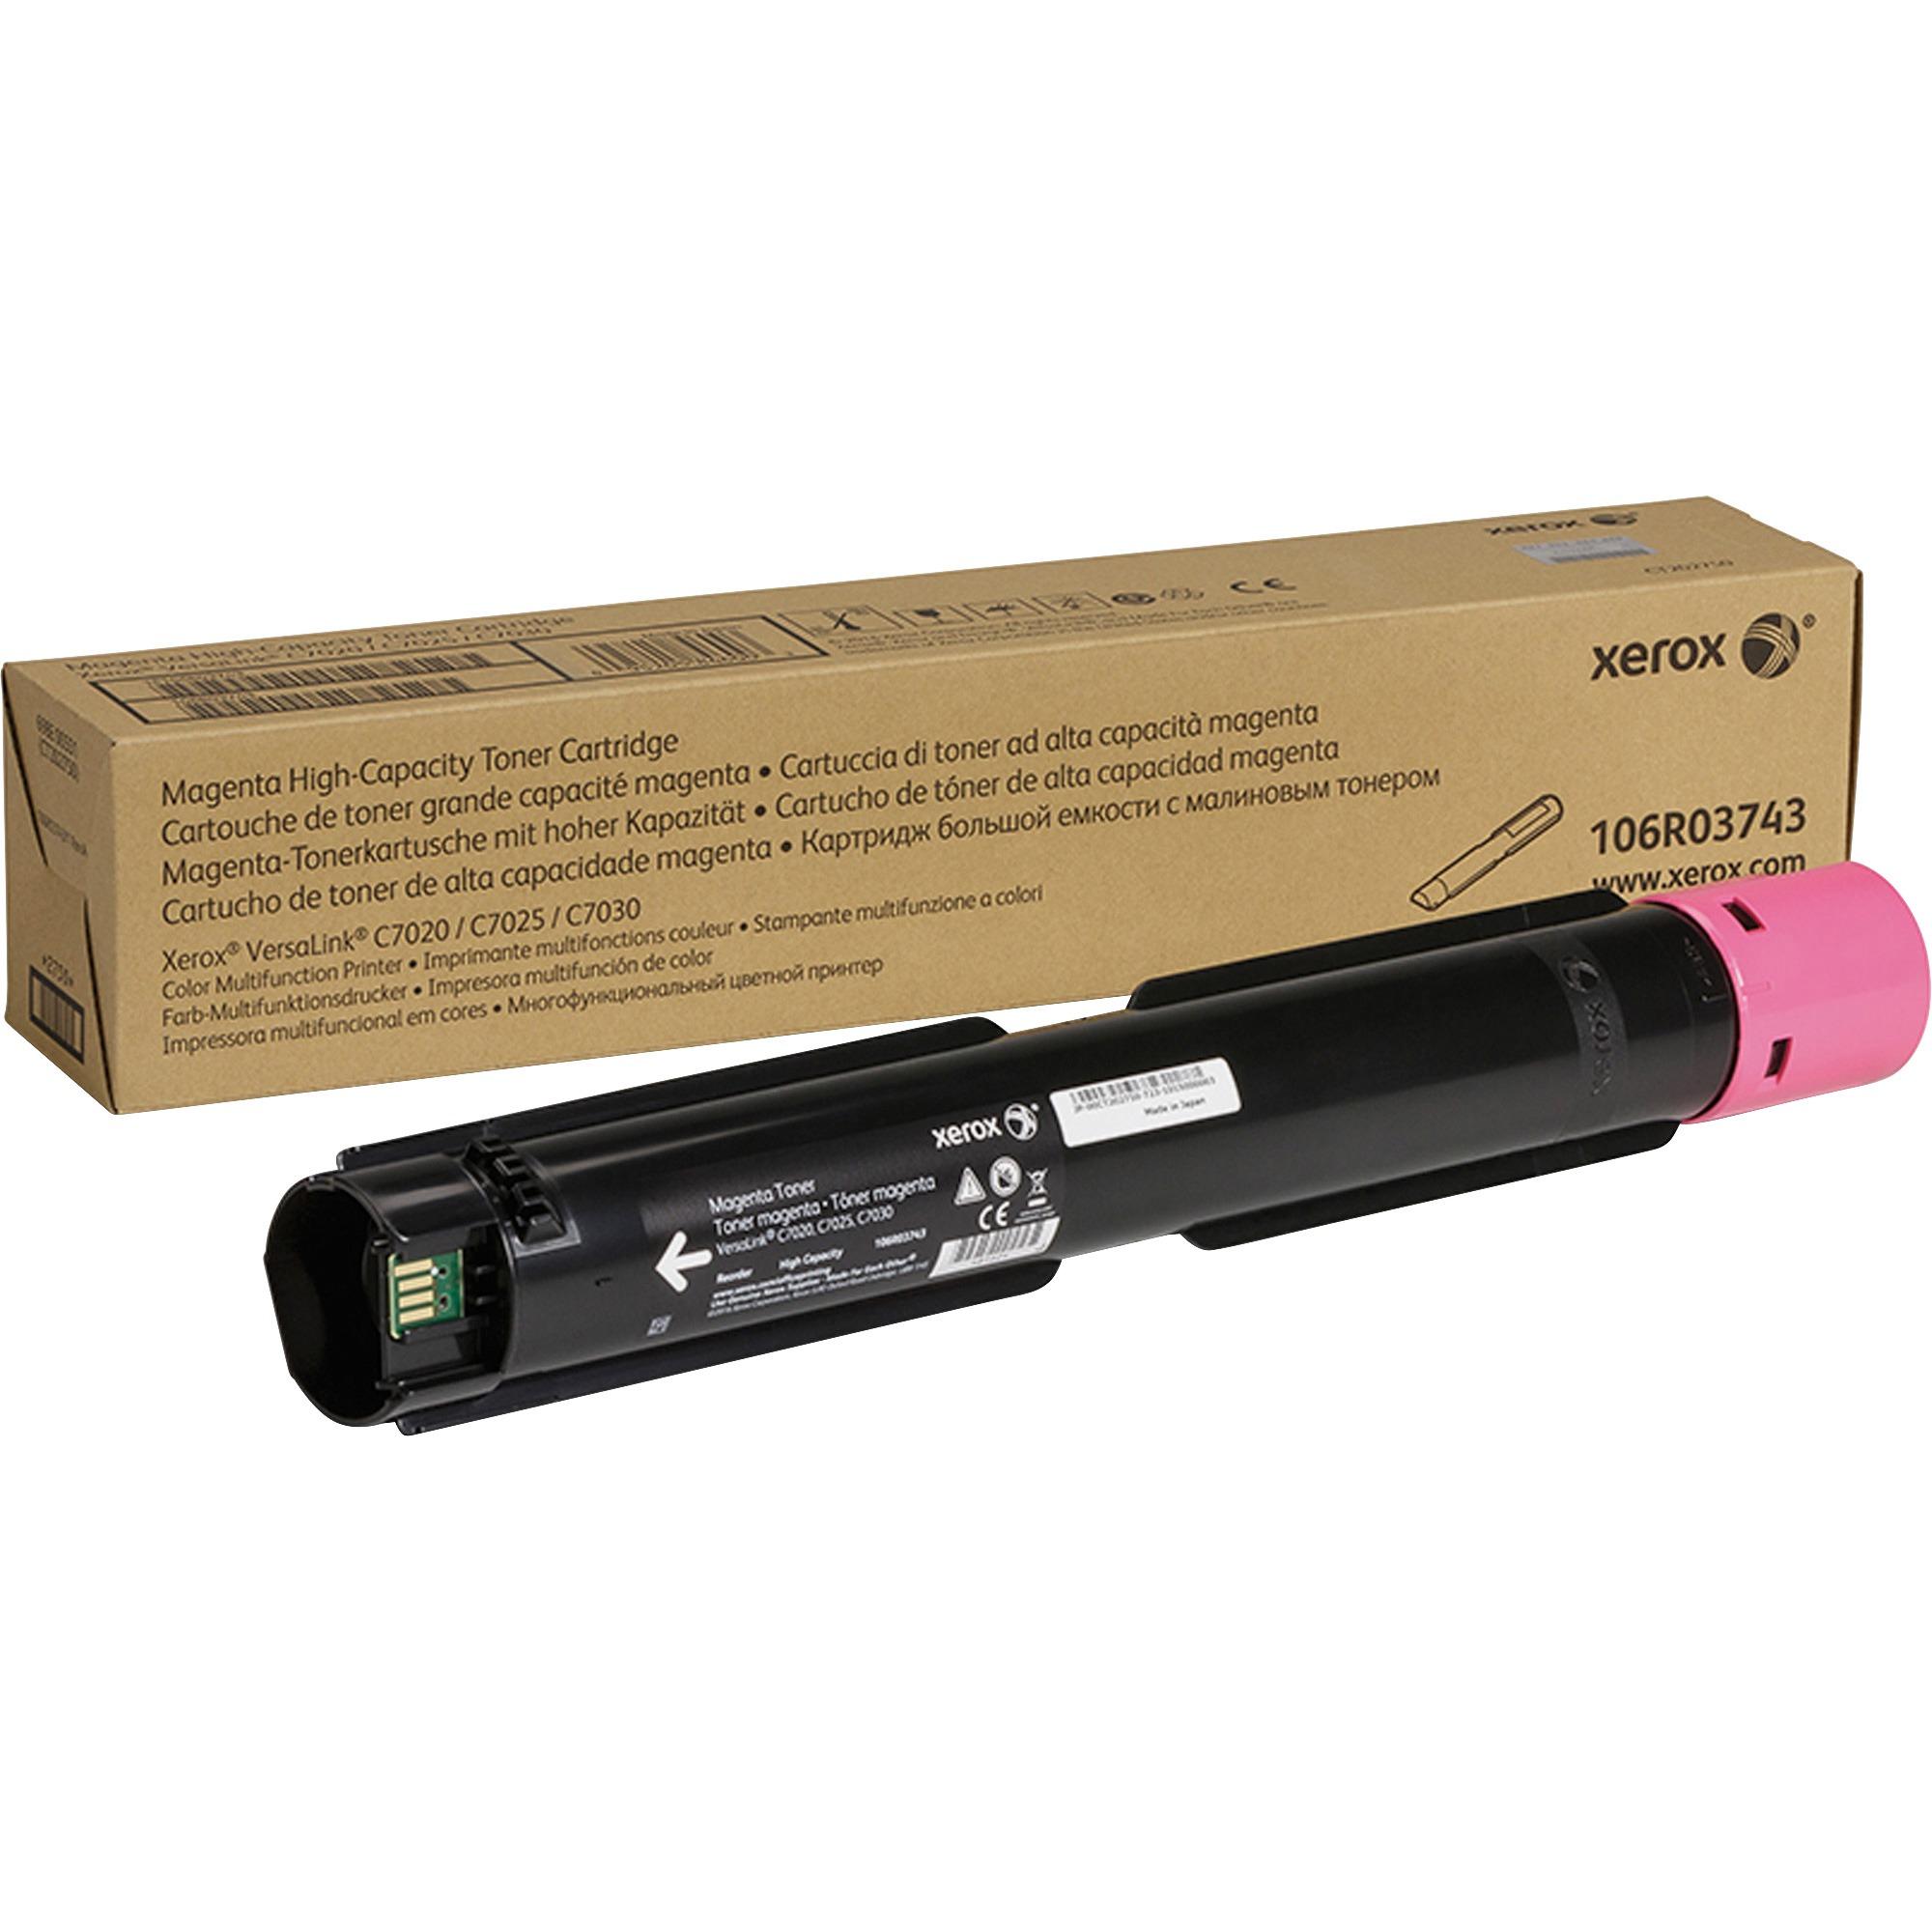 Xerox Magenta Toner Cartridge (9,800 Yield) 106R03743